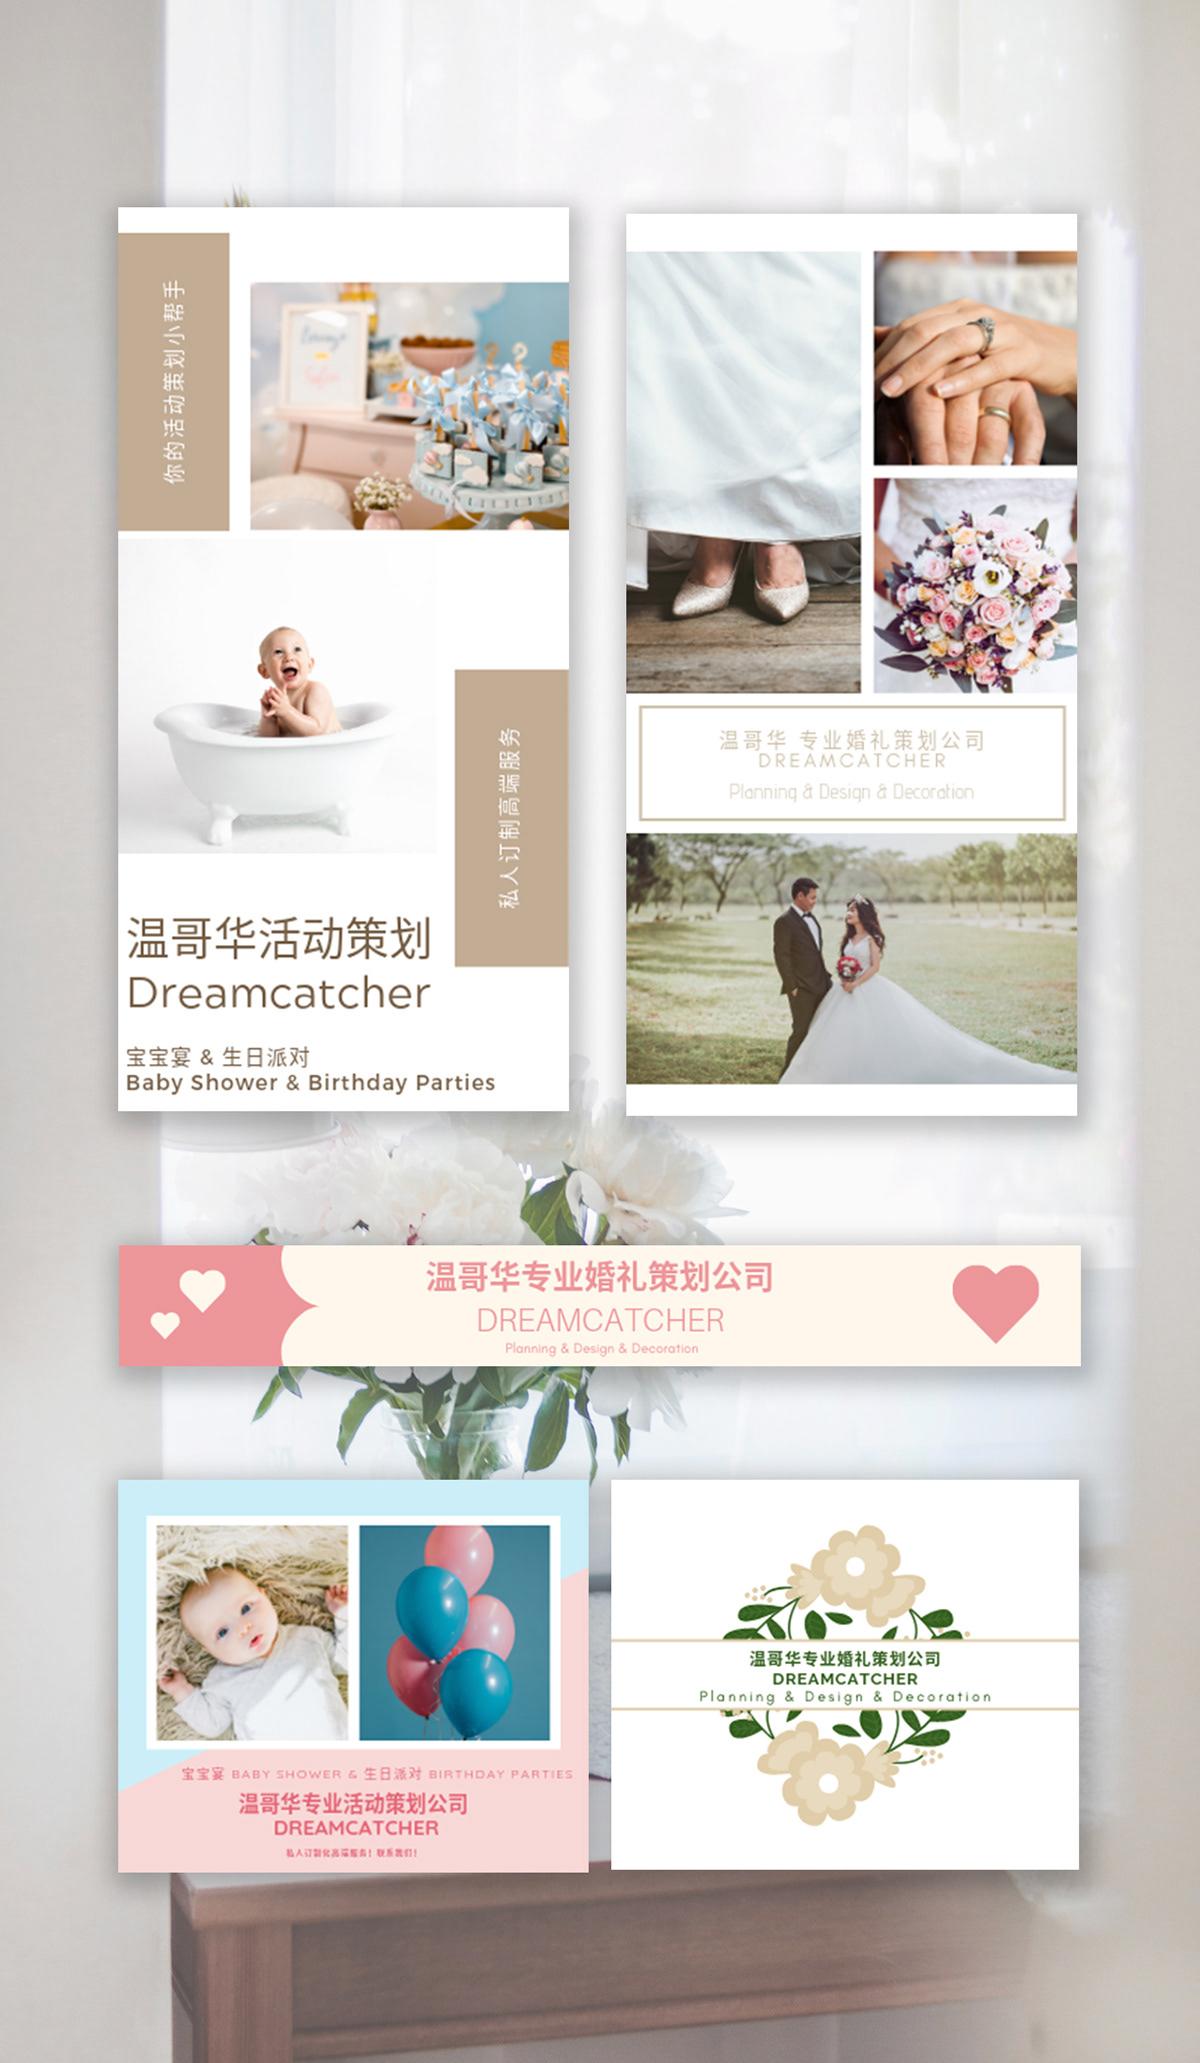 marketing   Advertising  wedding design graphic banners